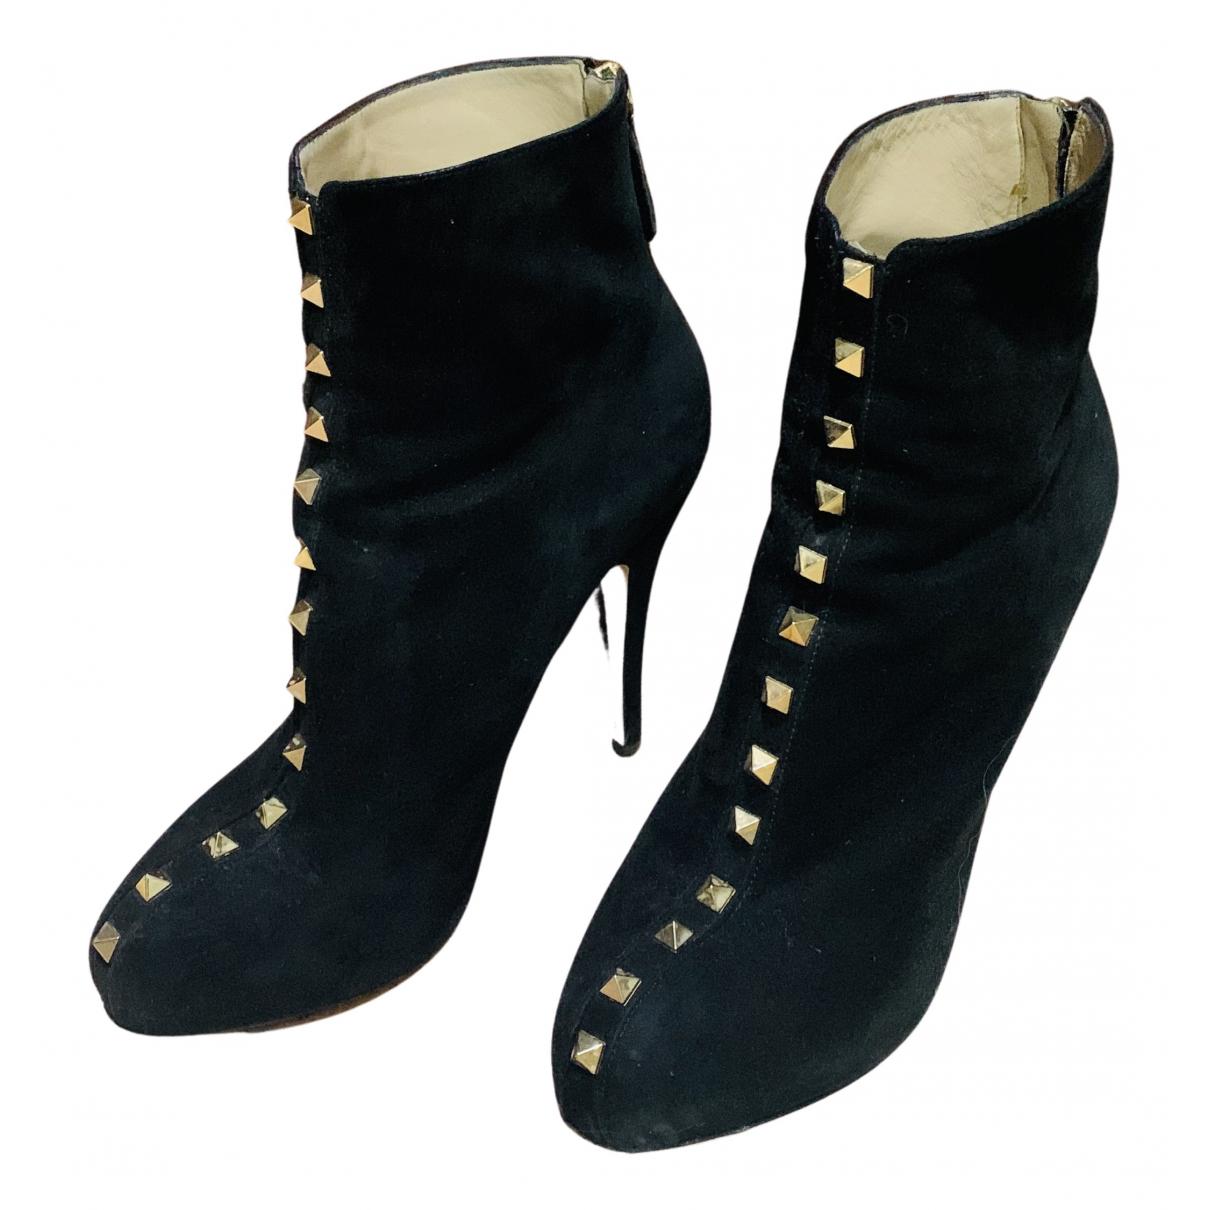 Valentino Garavani Rockstud Black Suede Ankle boots for Women 38 EU